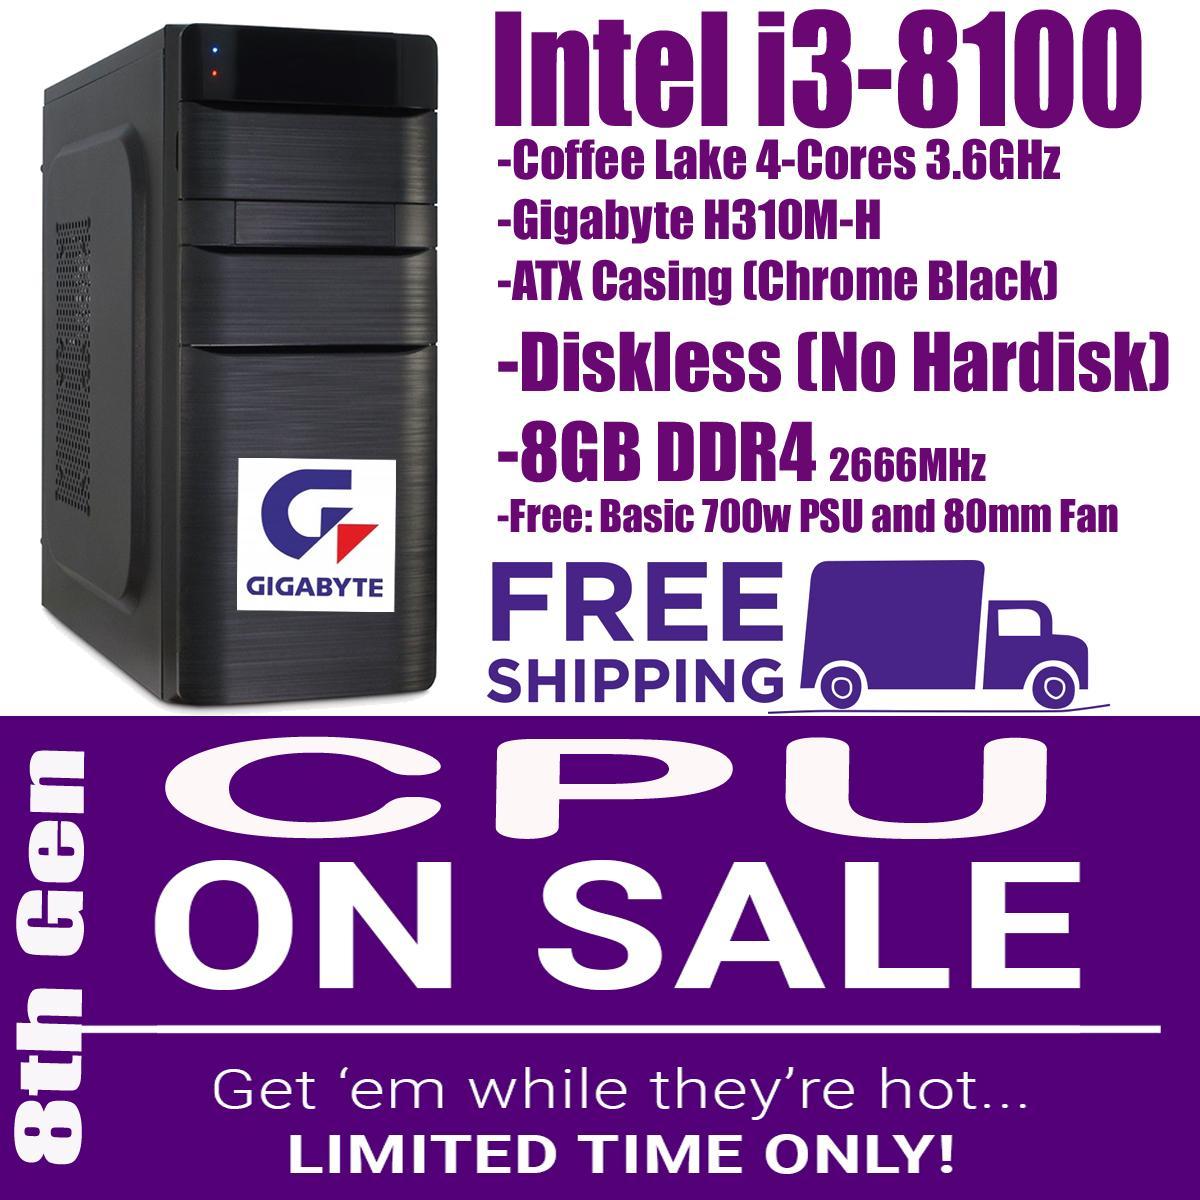 CPU Diskless - 8GB , Intel Core i3-8100 Coffee Lake Quad-Core 3 6 GHz LGA  1151 (300 Series) 65W Tray type (alternative to: core i3-7100 i5-8400